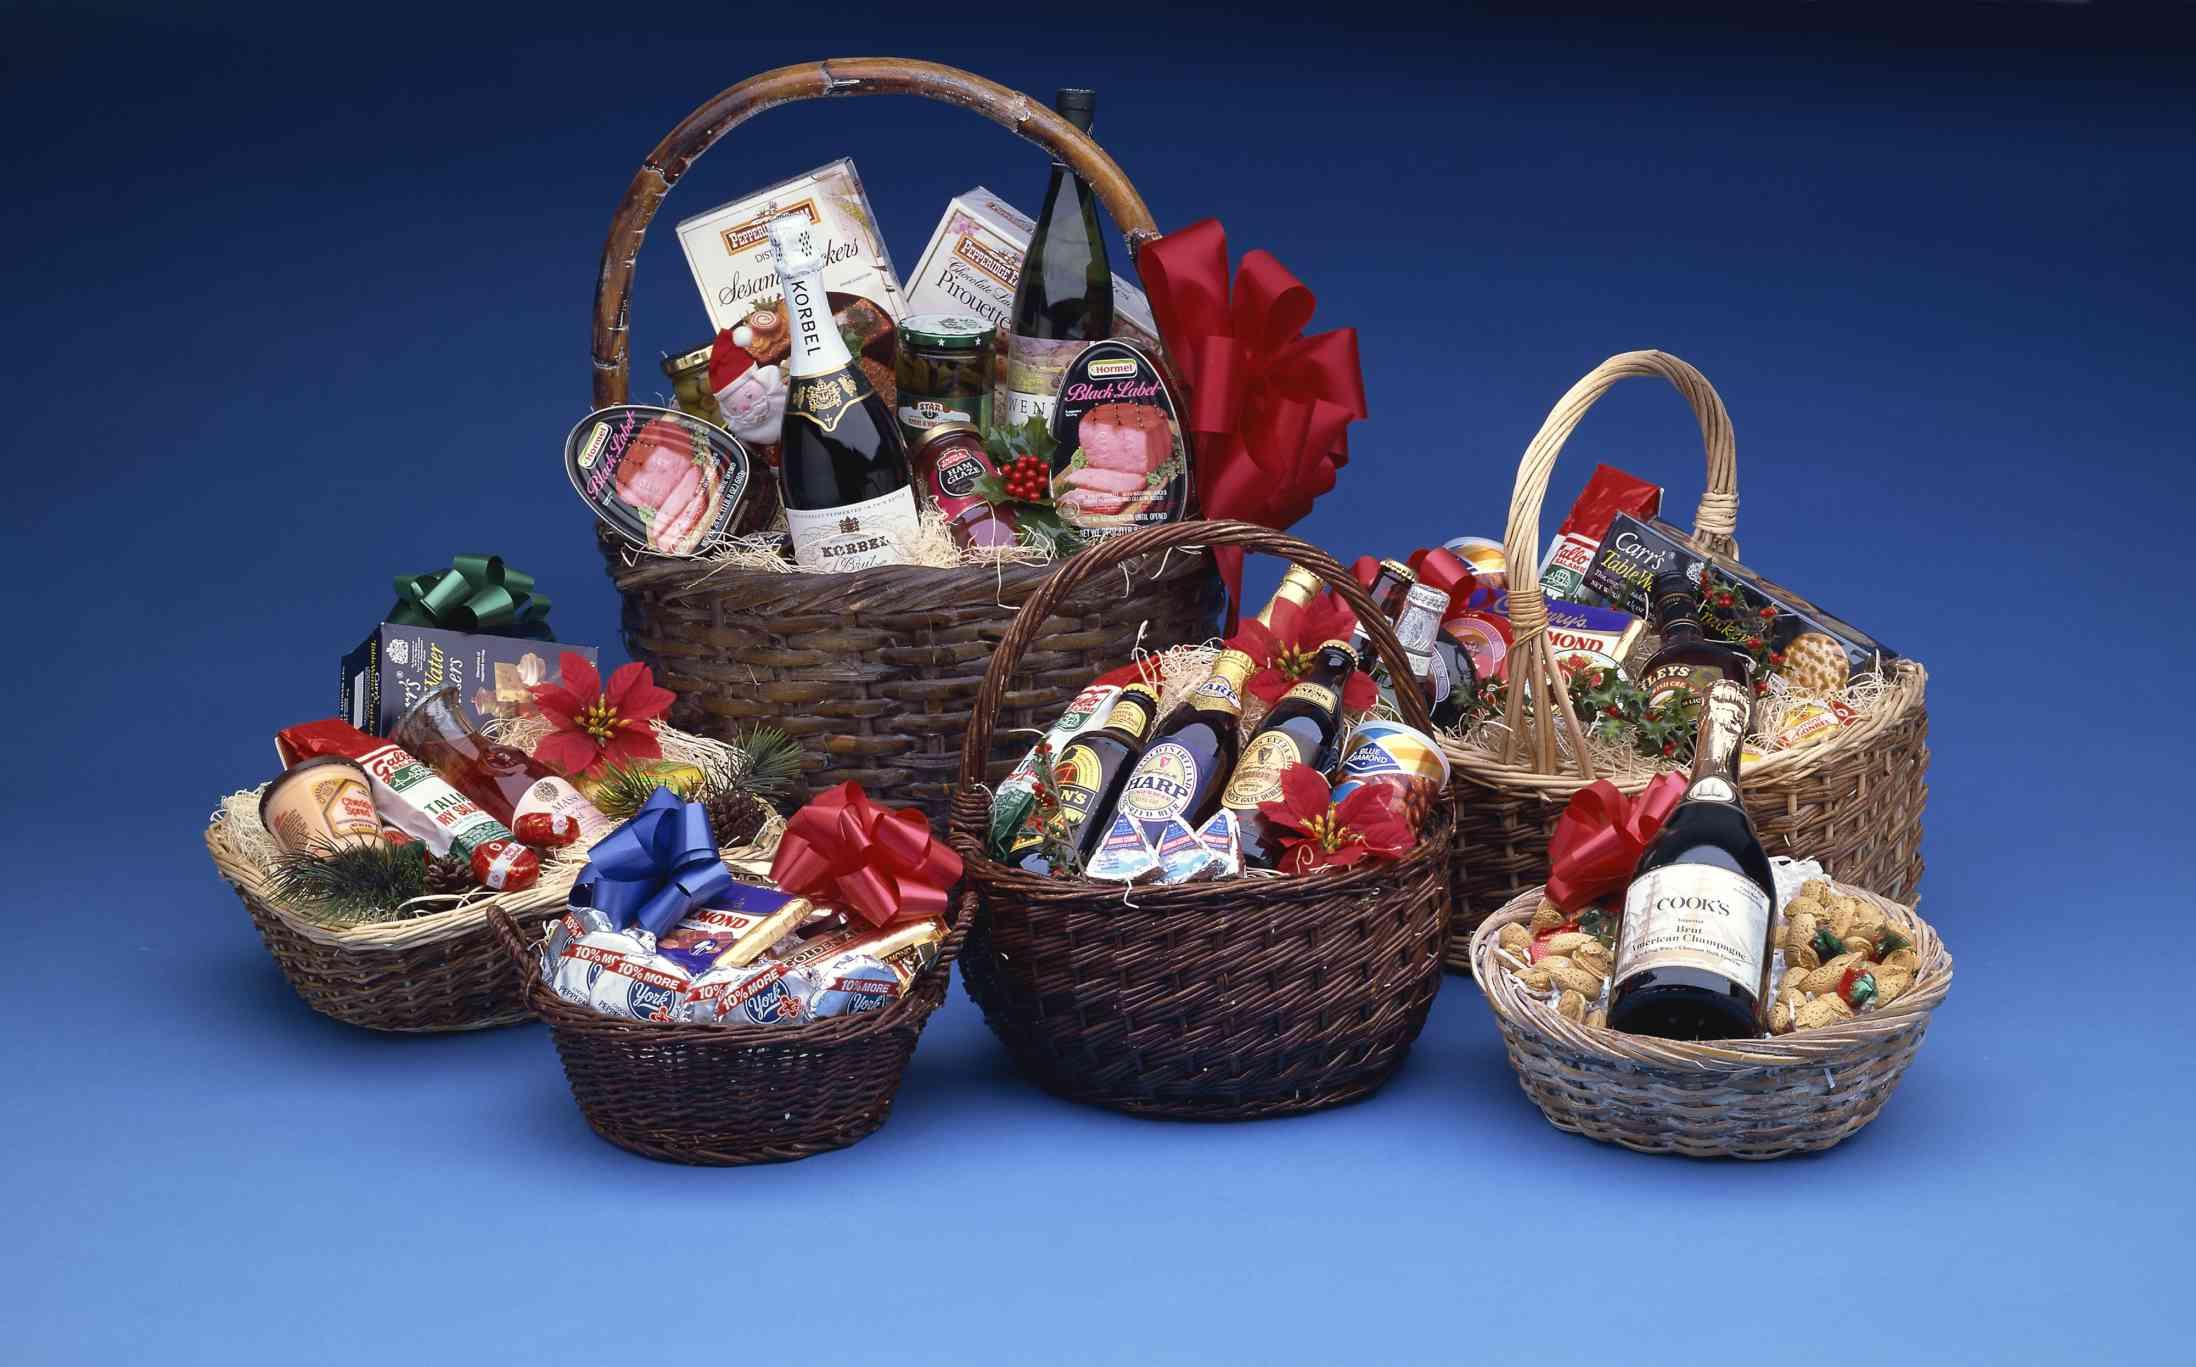 Diabetes Friendly Food And Beverage Gift Basket Ideas